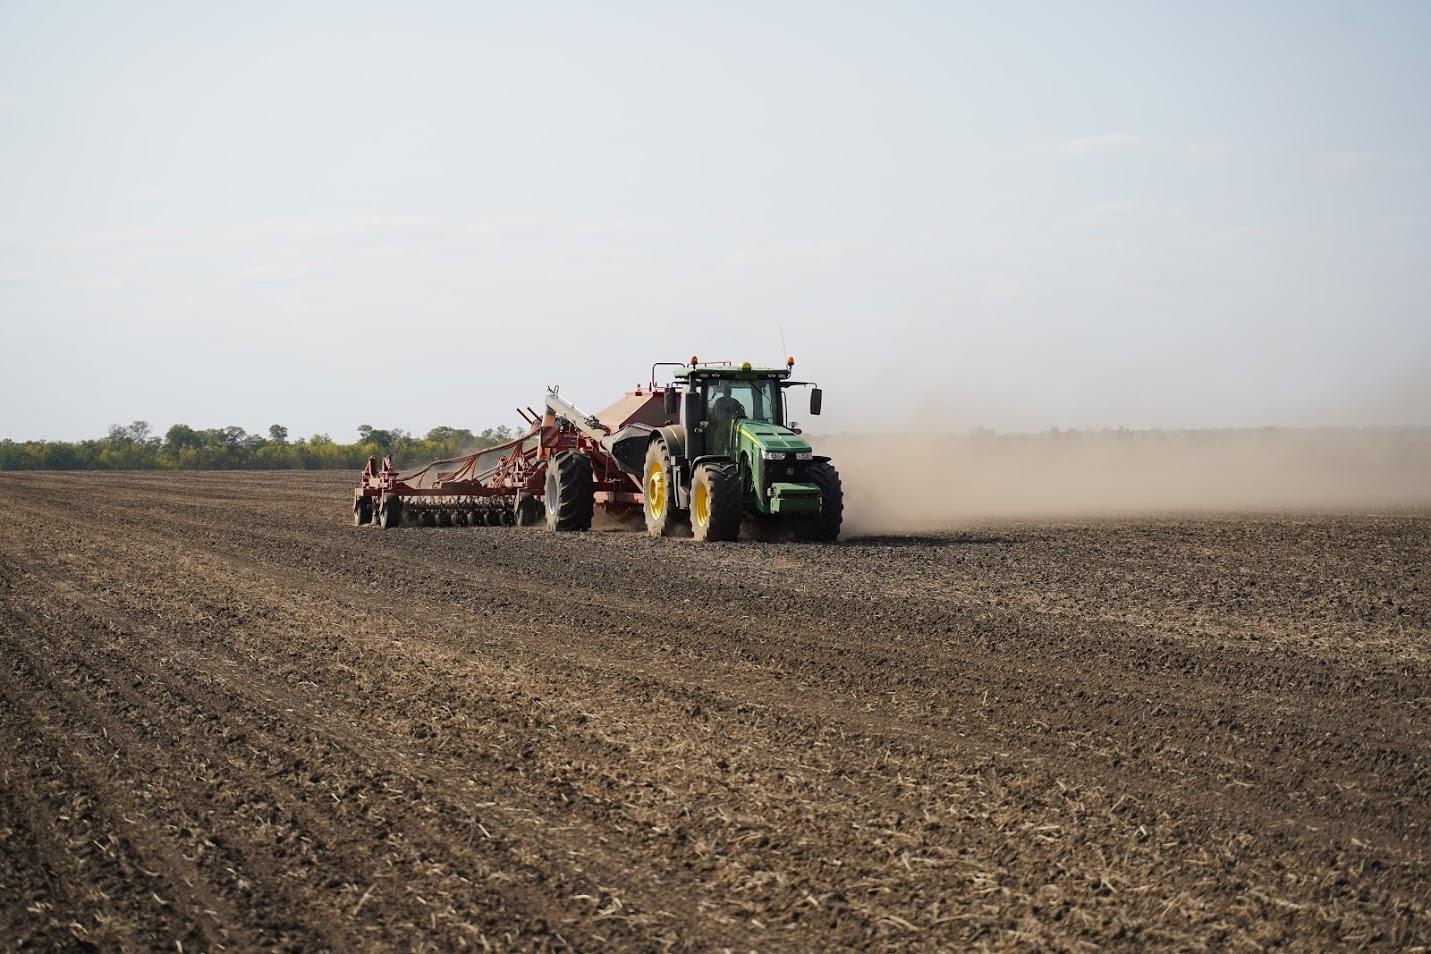 traktor.JPG (333 KB)